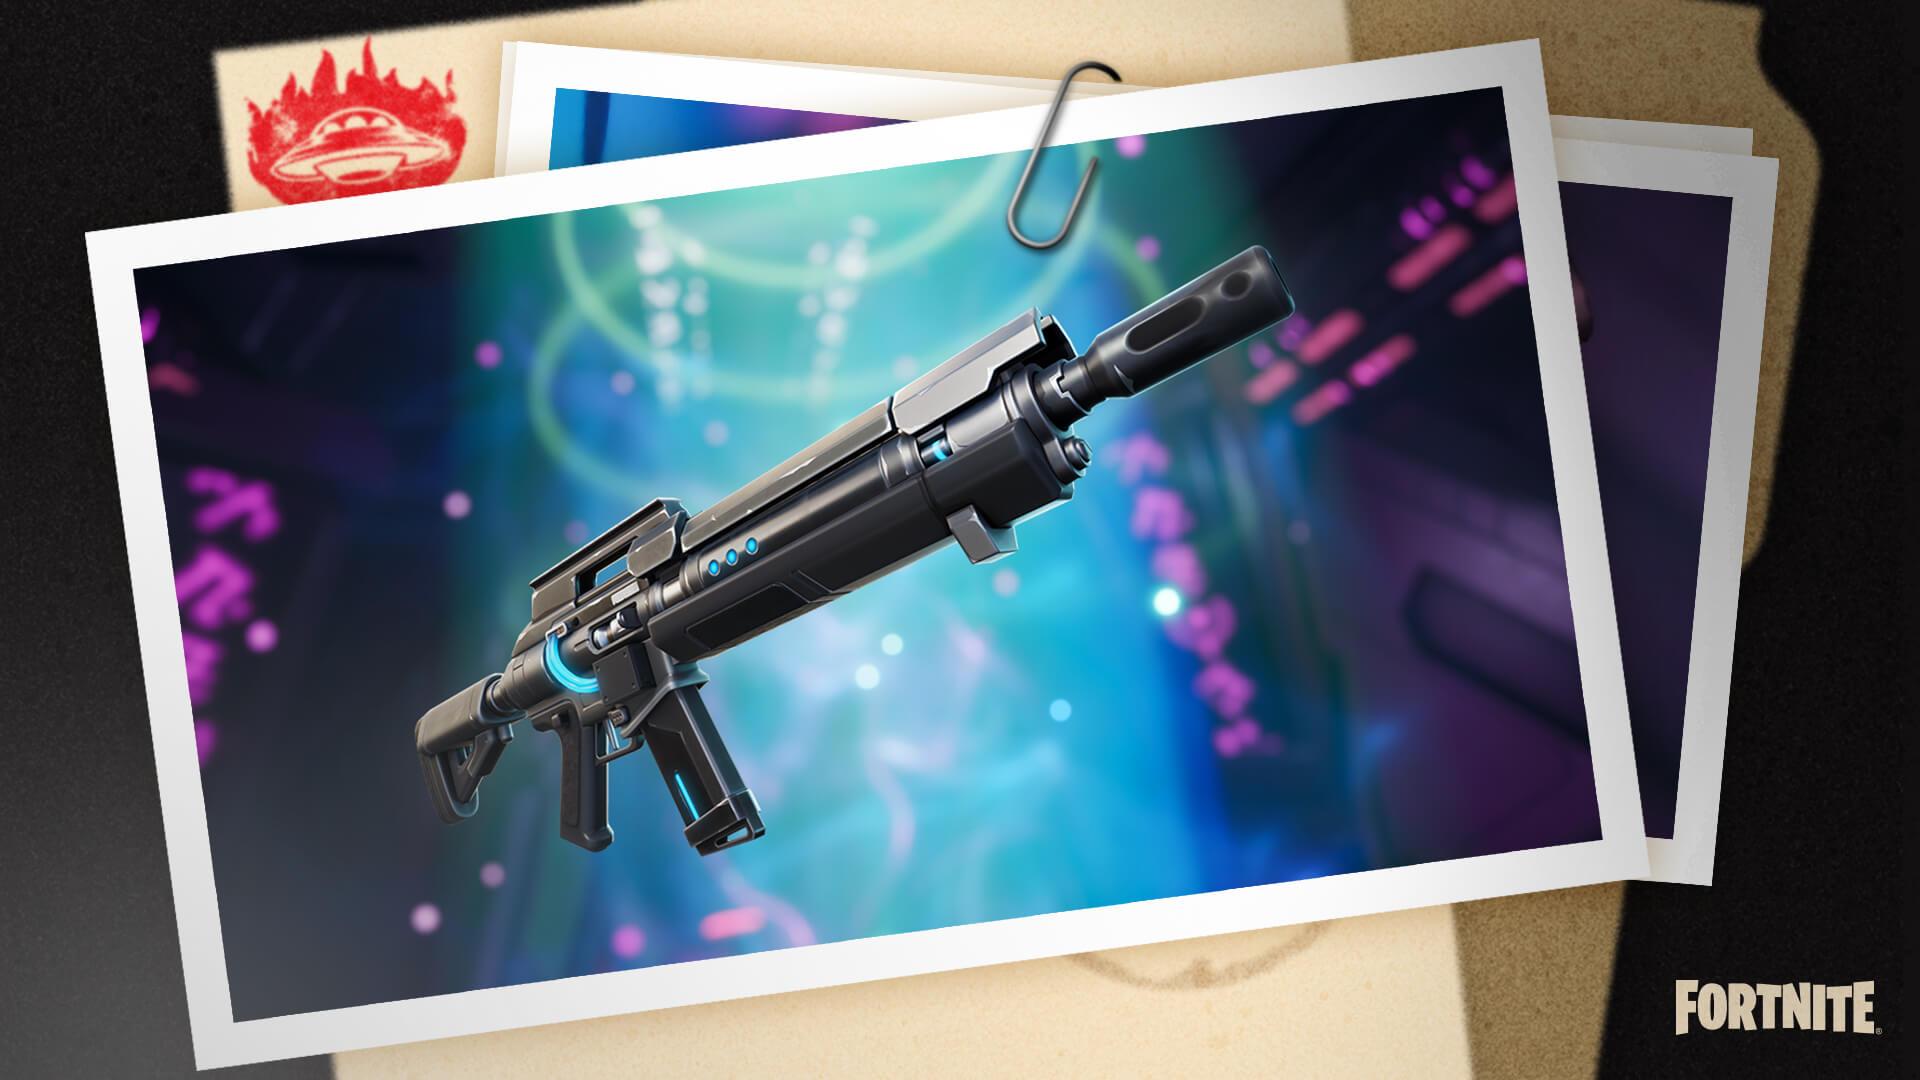 fortnite mythic weapons season 7